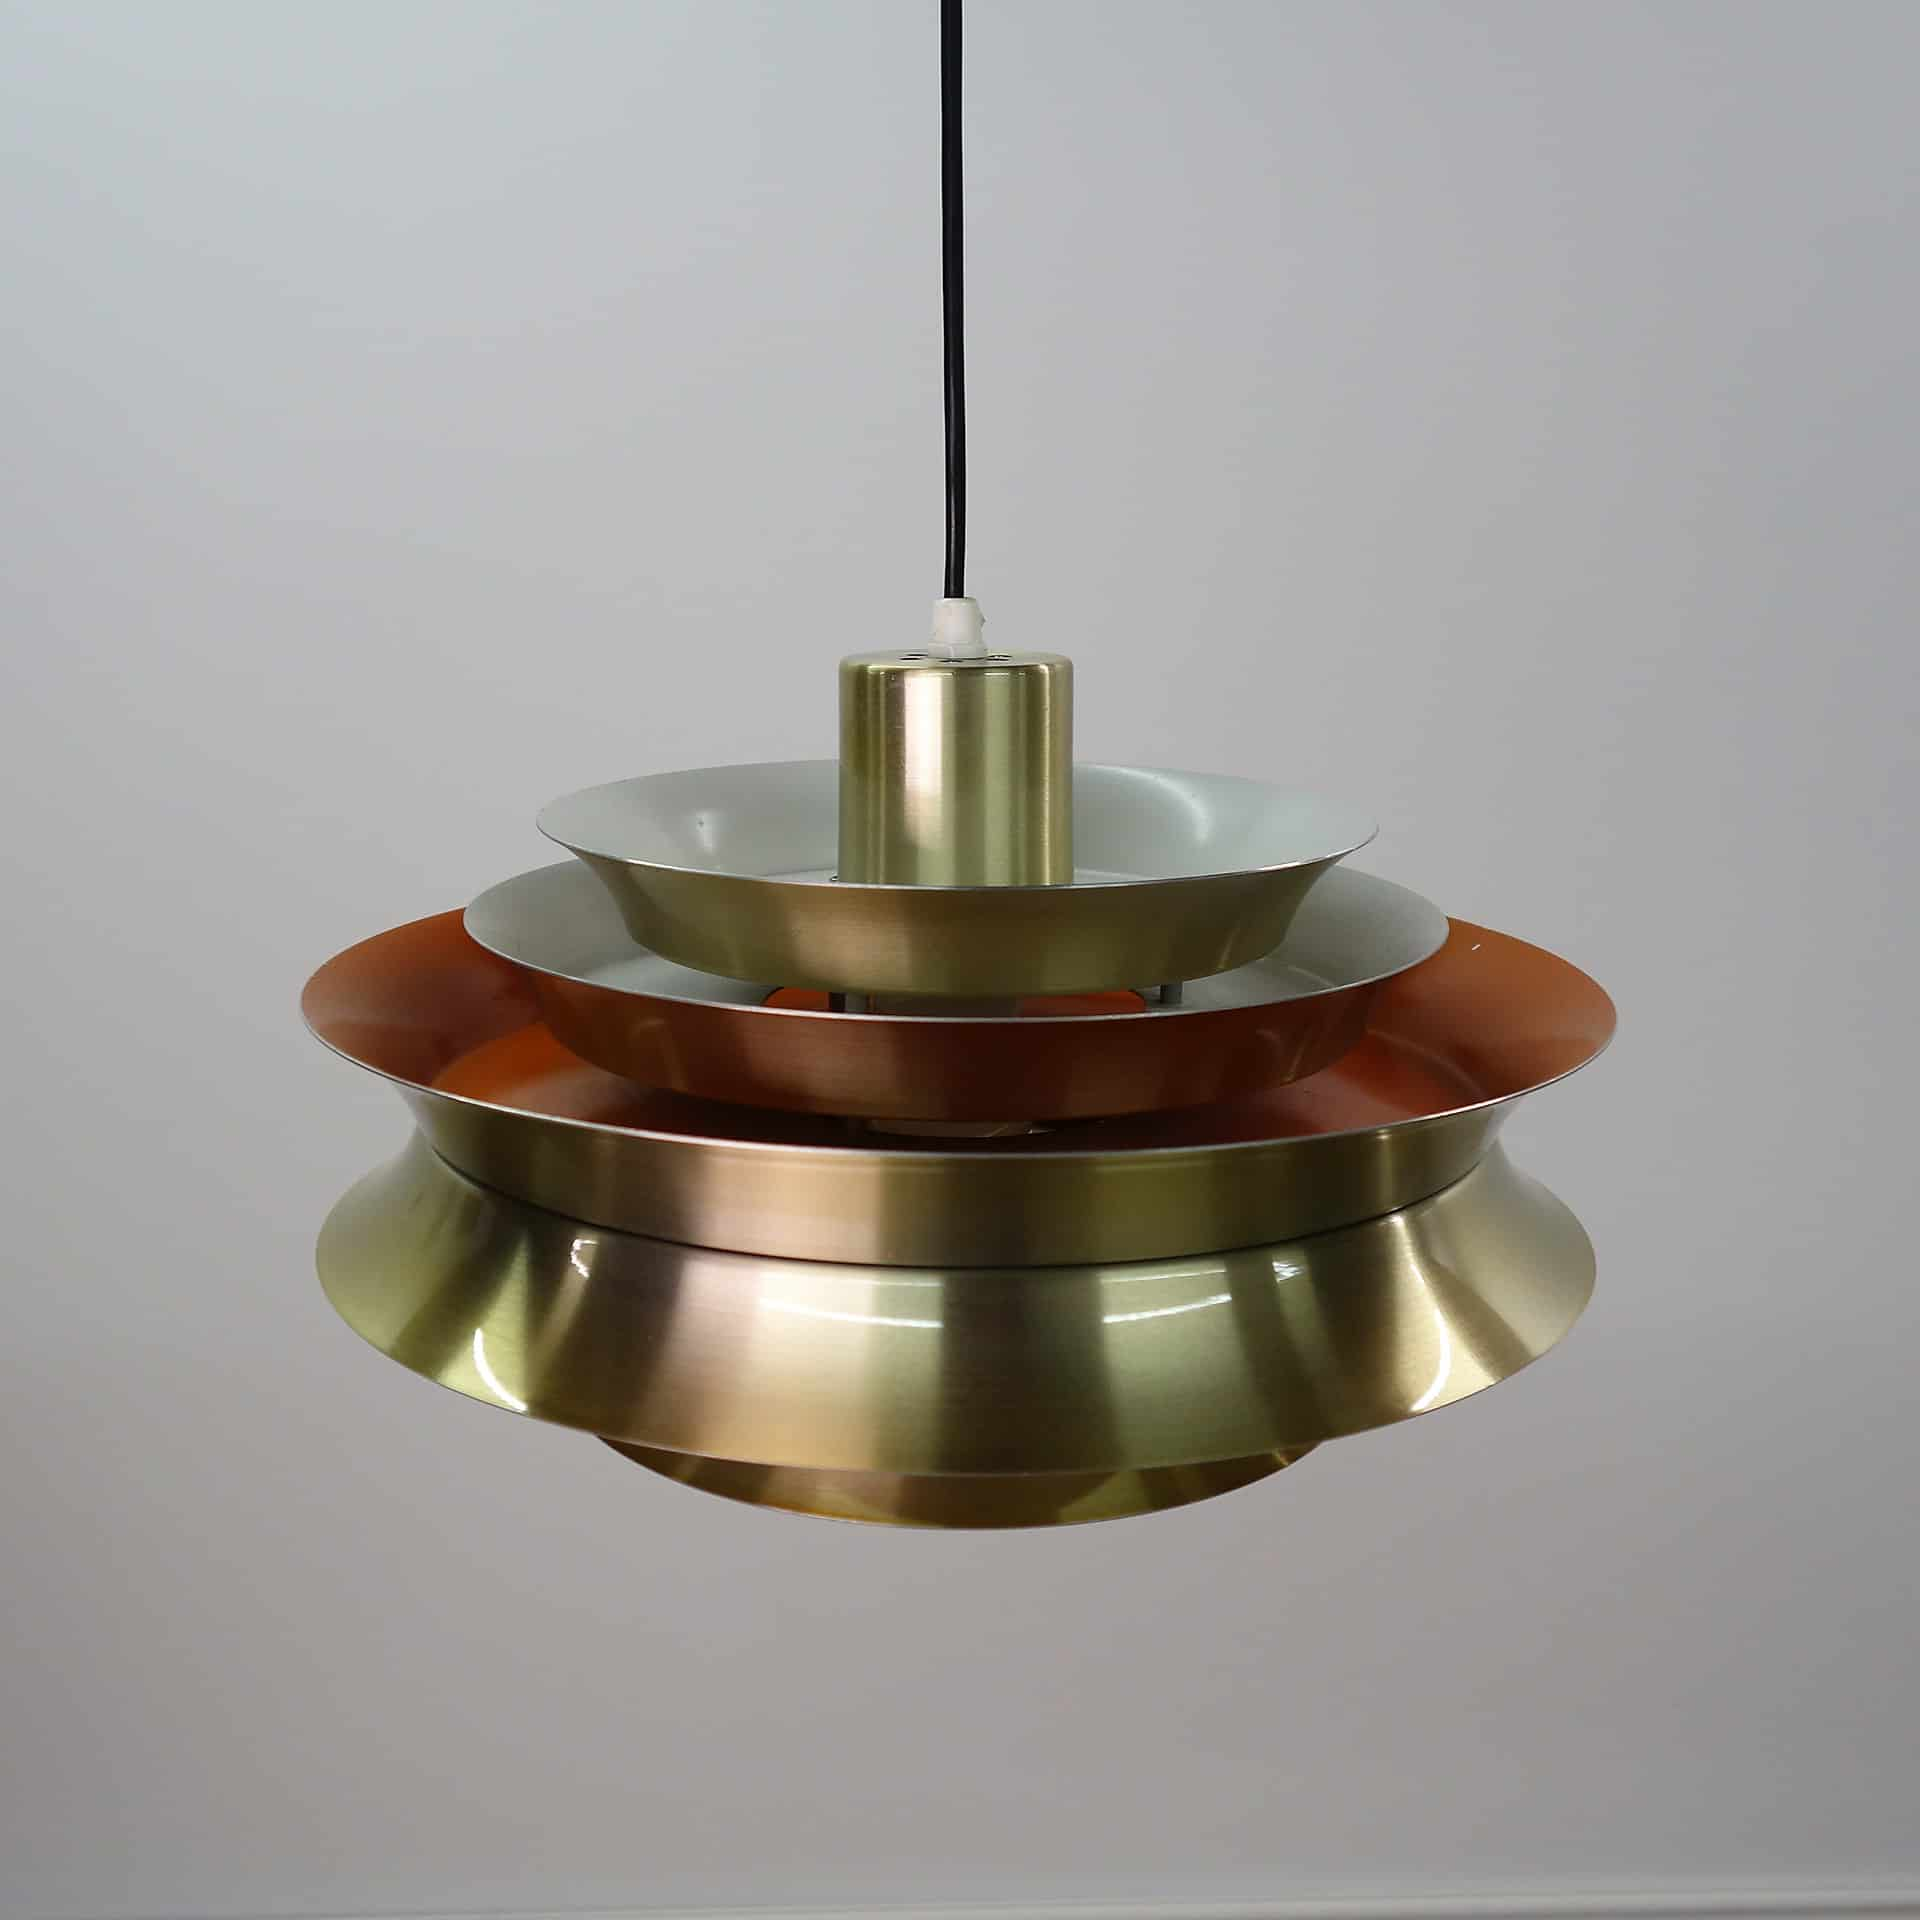 Fog & Morup style brass multi tiered light